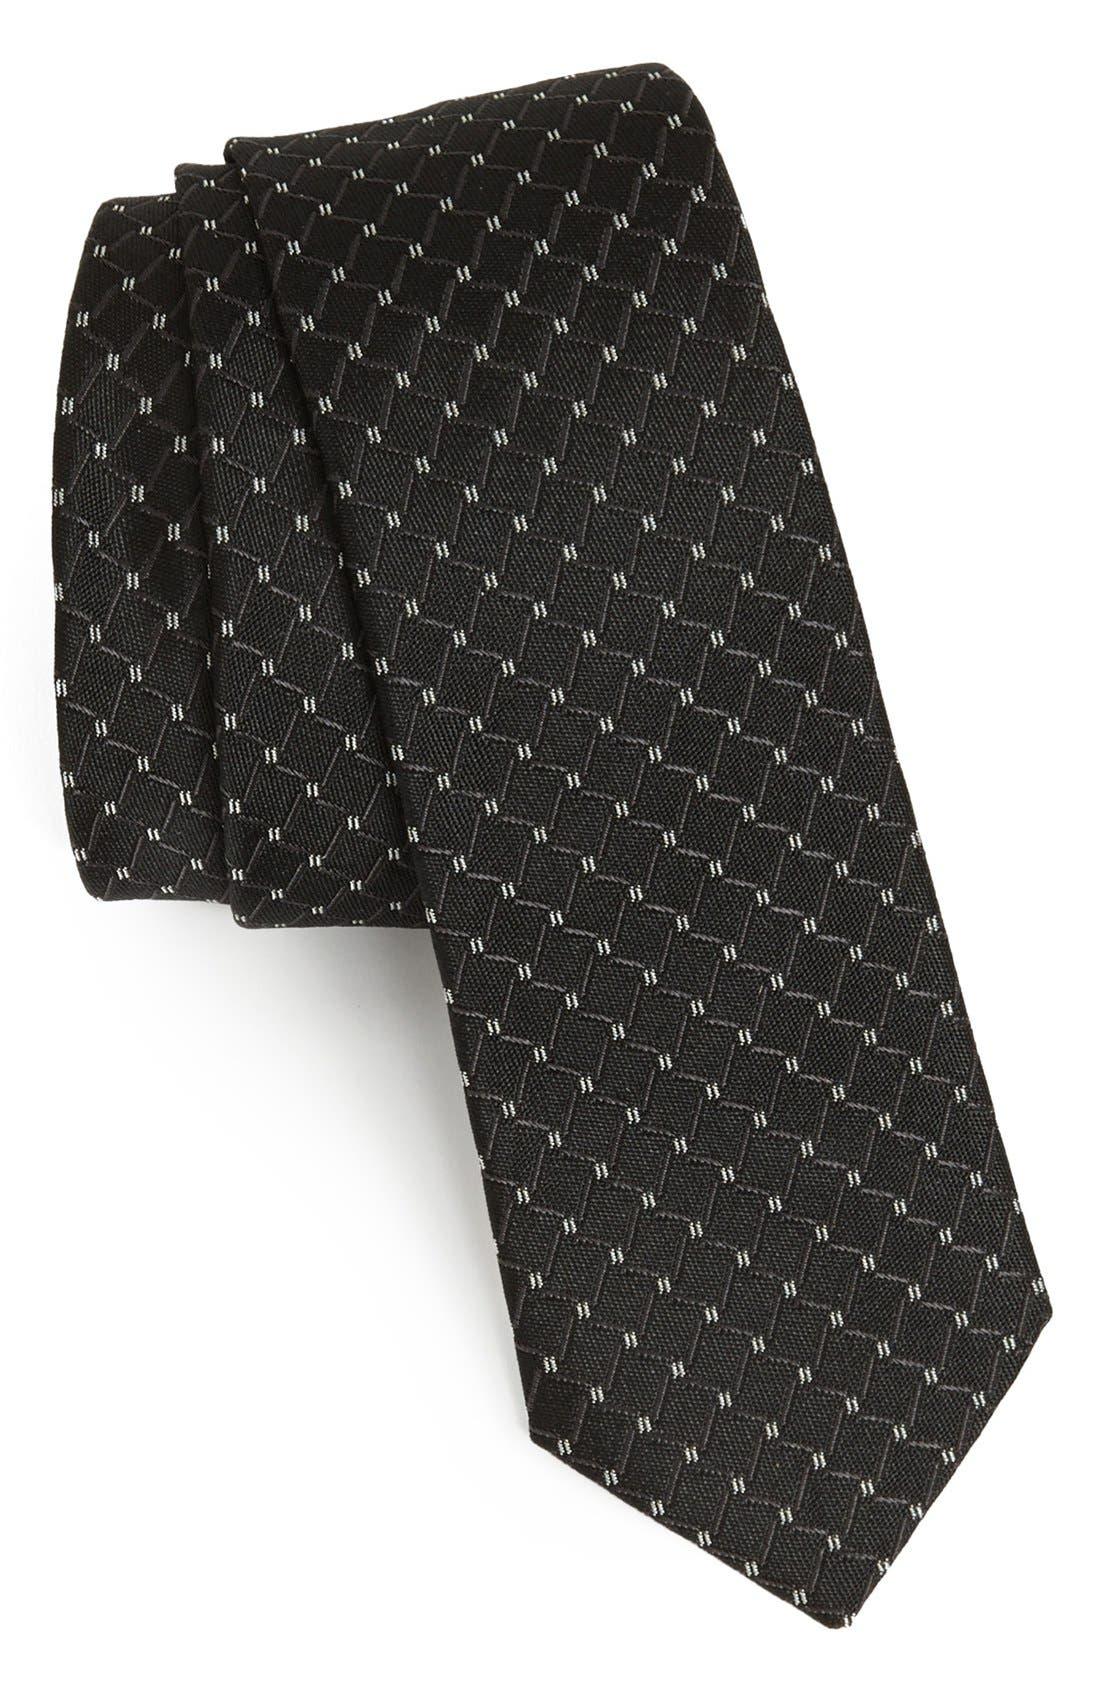 Alternate Image 1 Selected - Dolce&Gabbana Martini Weave Silk Tie